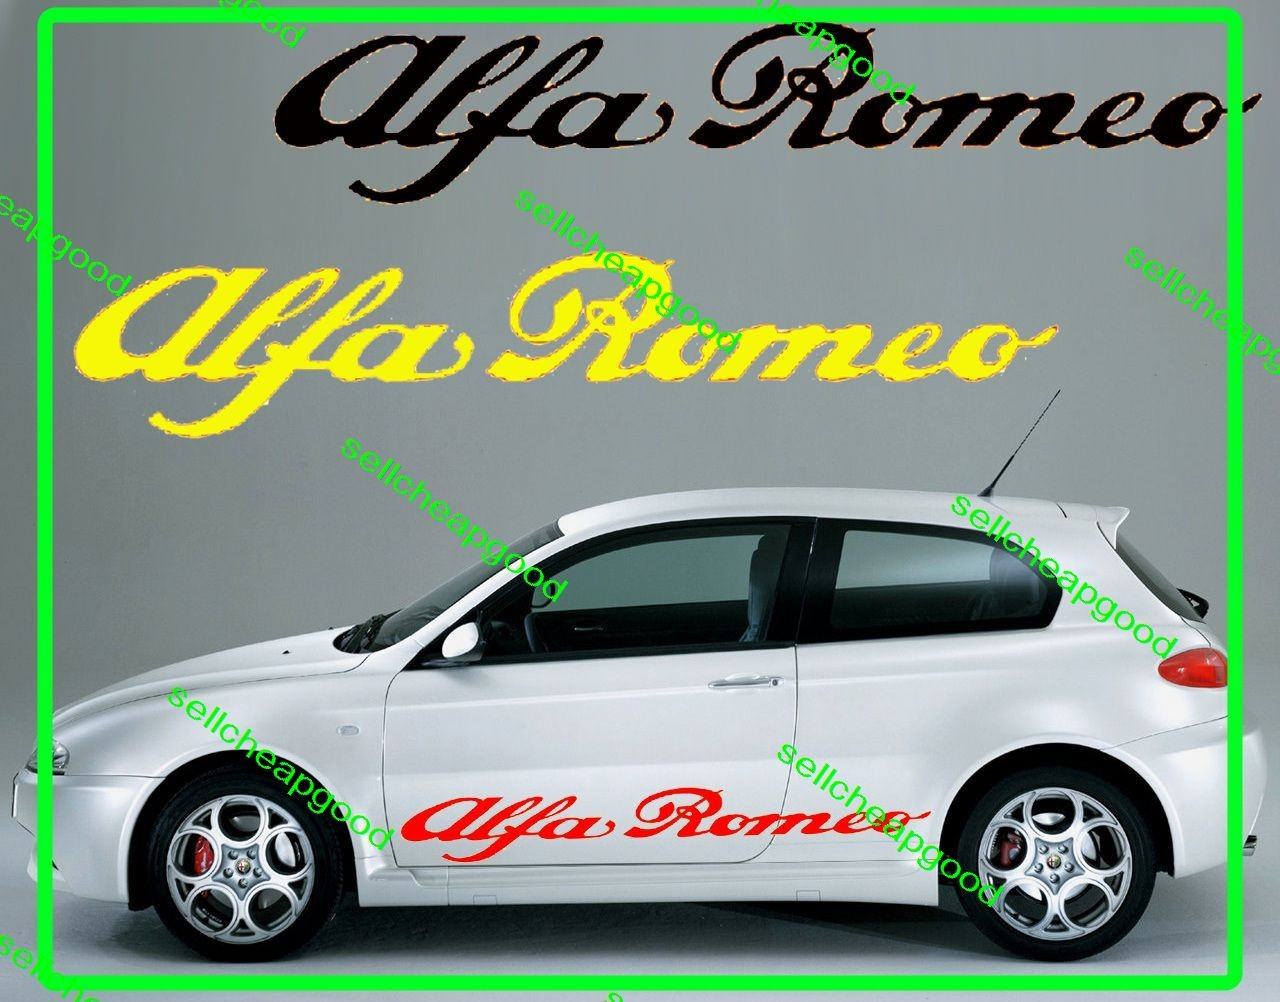 alfa romeo sides skirt decal sticker for giulietta spider 159 gt junior gtv6 156 ebay. Black Bedroom Furniture Sets. Home Design Ideas